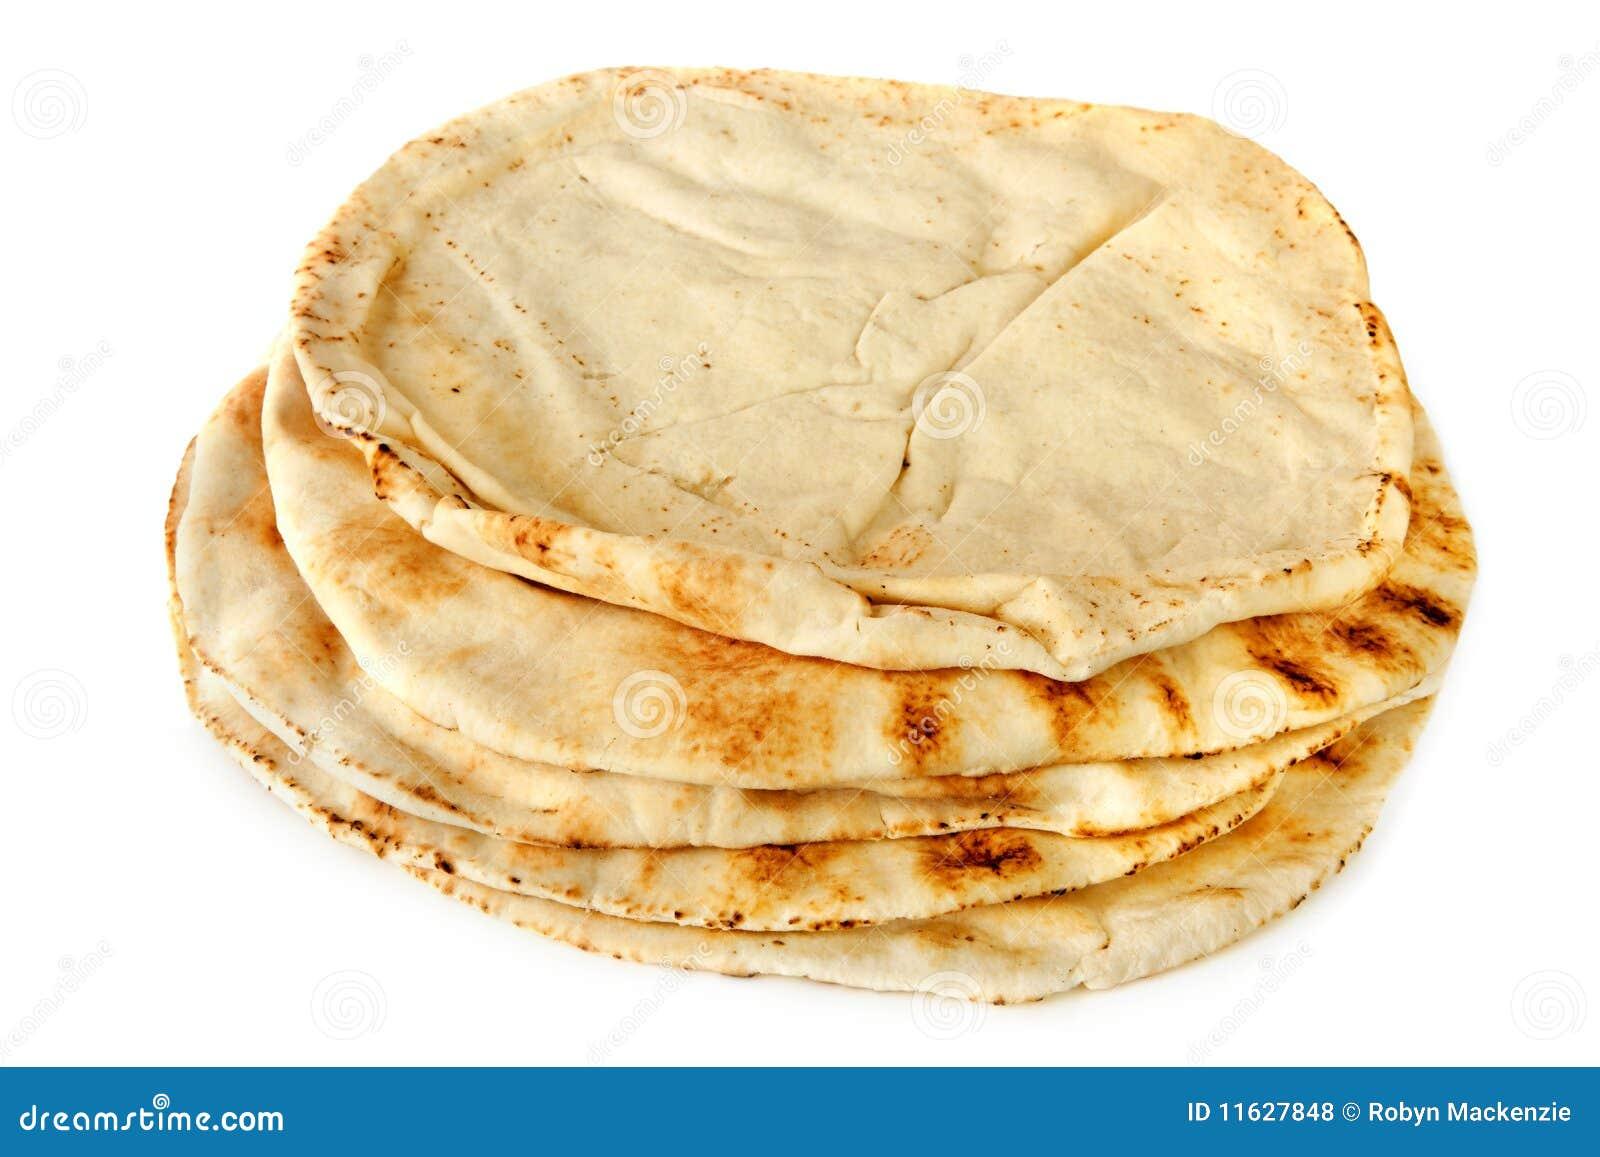 pita bread royalty free stock photos image 11627848 loaf of bread clip art image loaf of bread clipart mimi